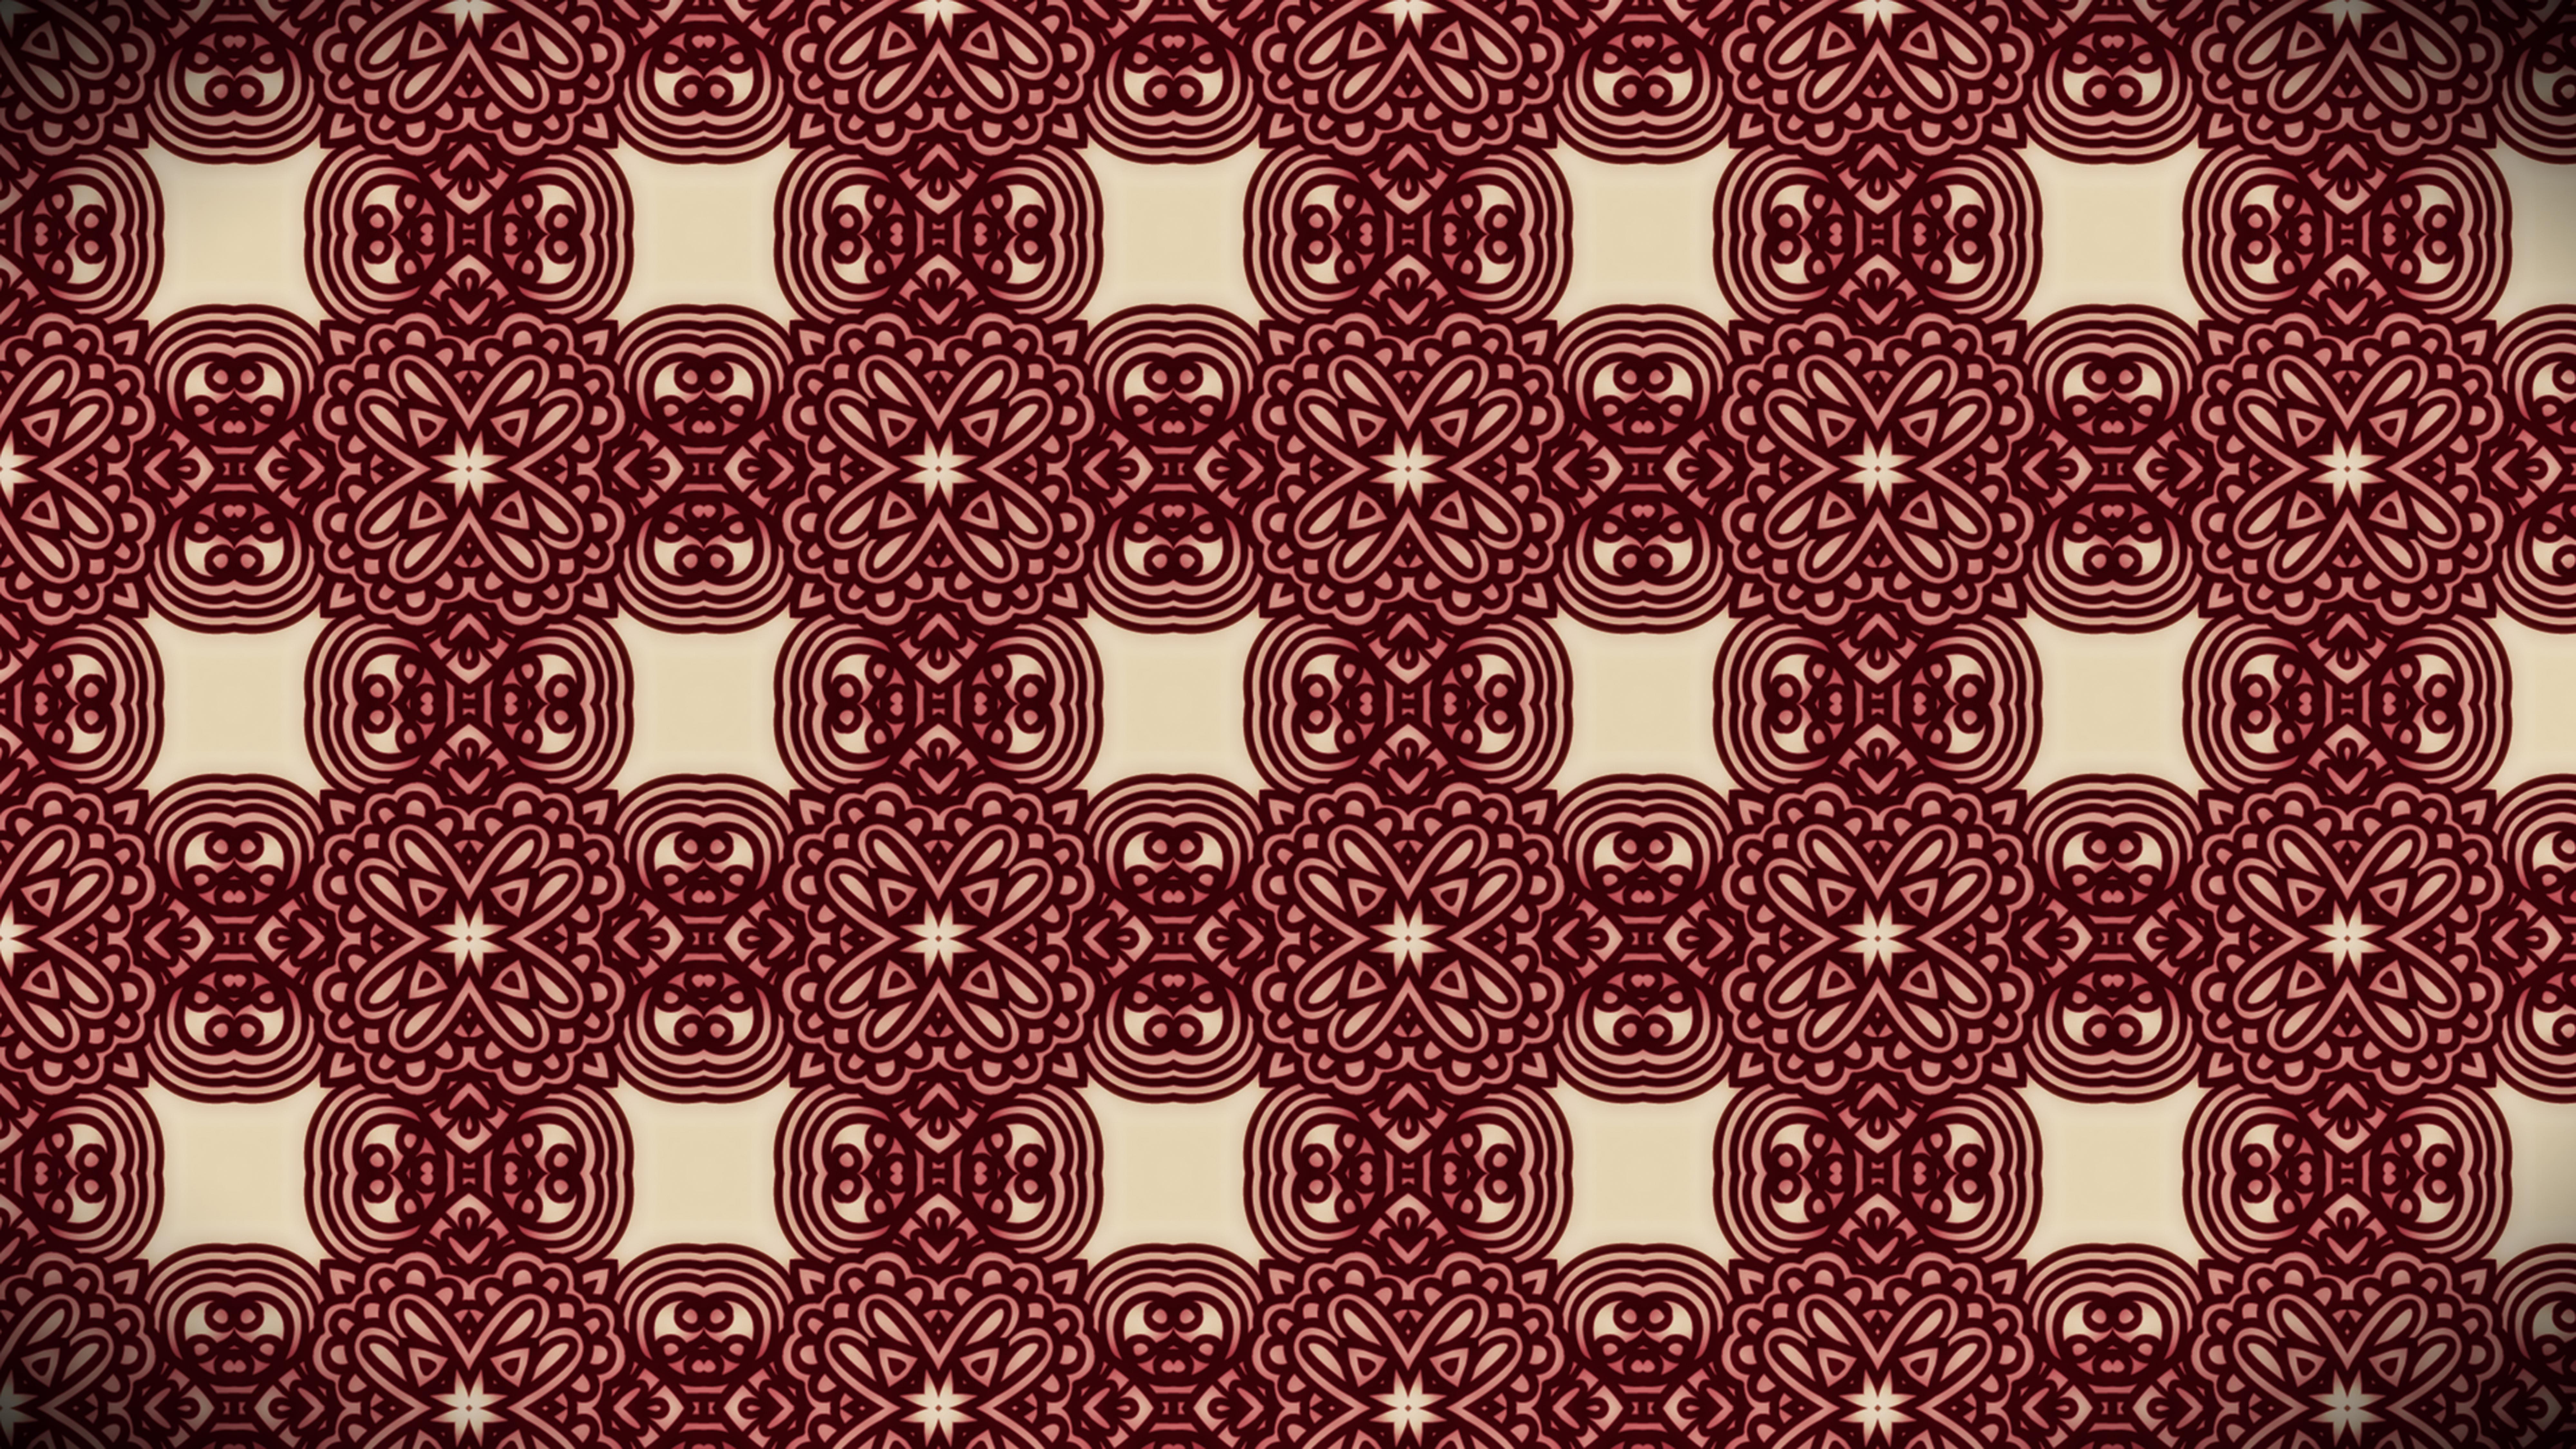 Dark Red Vintage Floral Pattern Texture Background Template